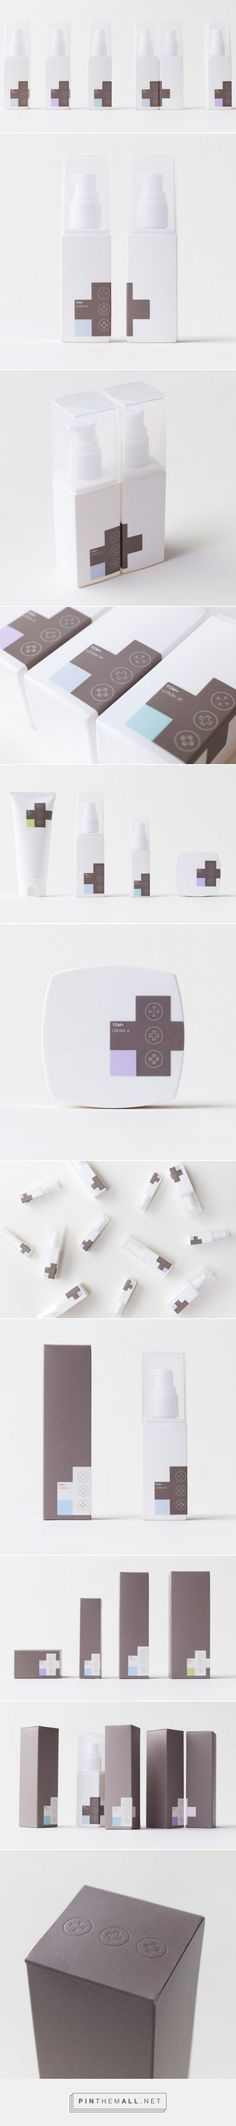 Nendo Design Japan Packaging Scincare based on TCM